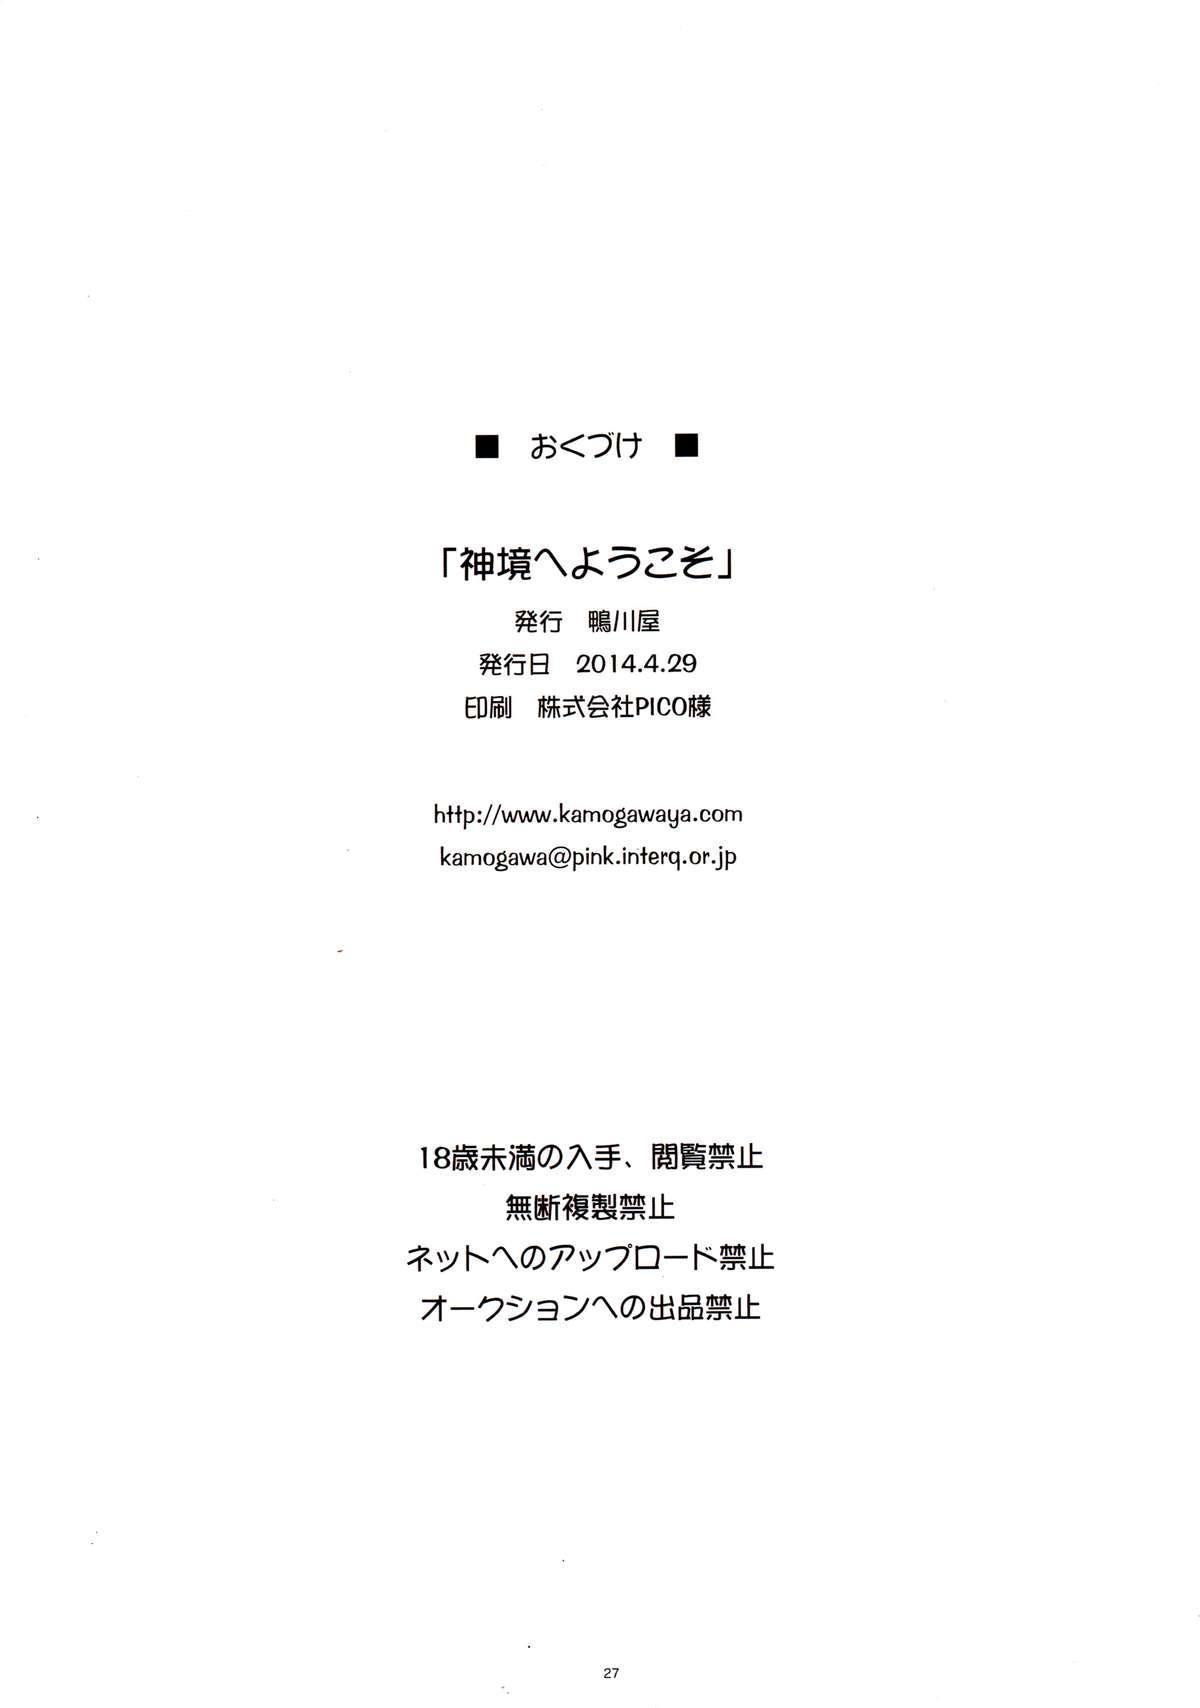 Shinkyou e Youkoso 26